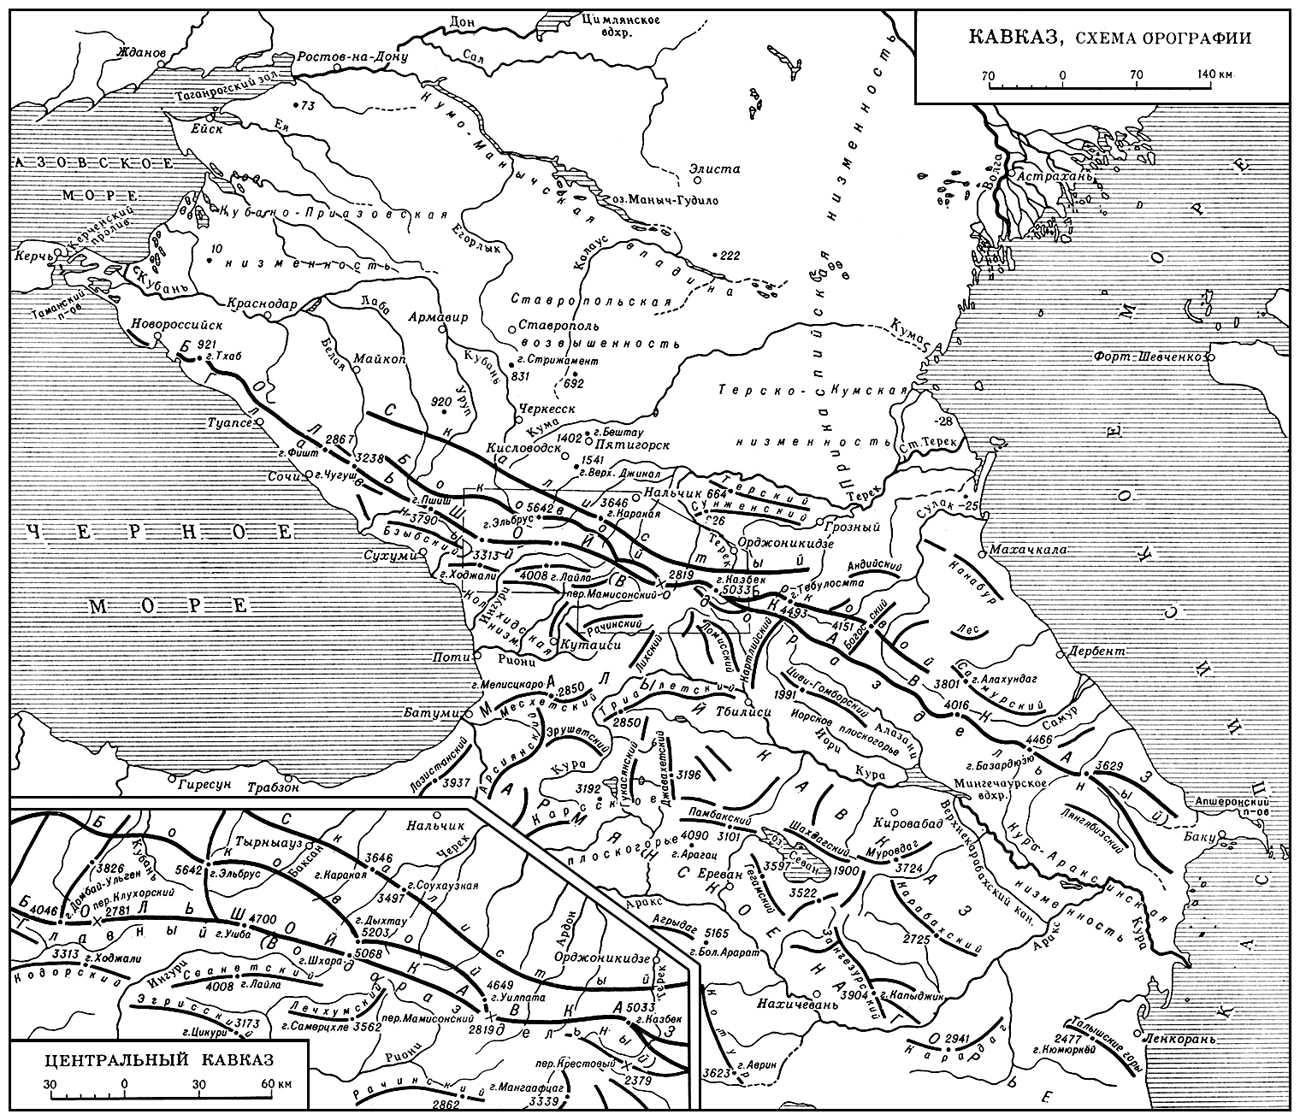 Кавказ. Схема орографии. Кавказ.